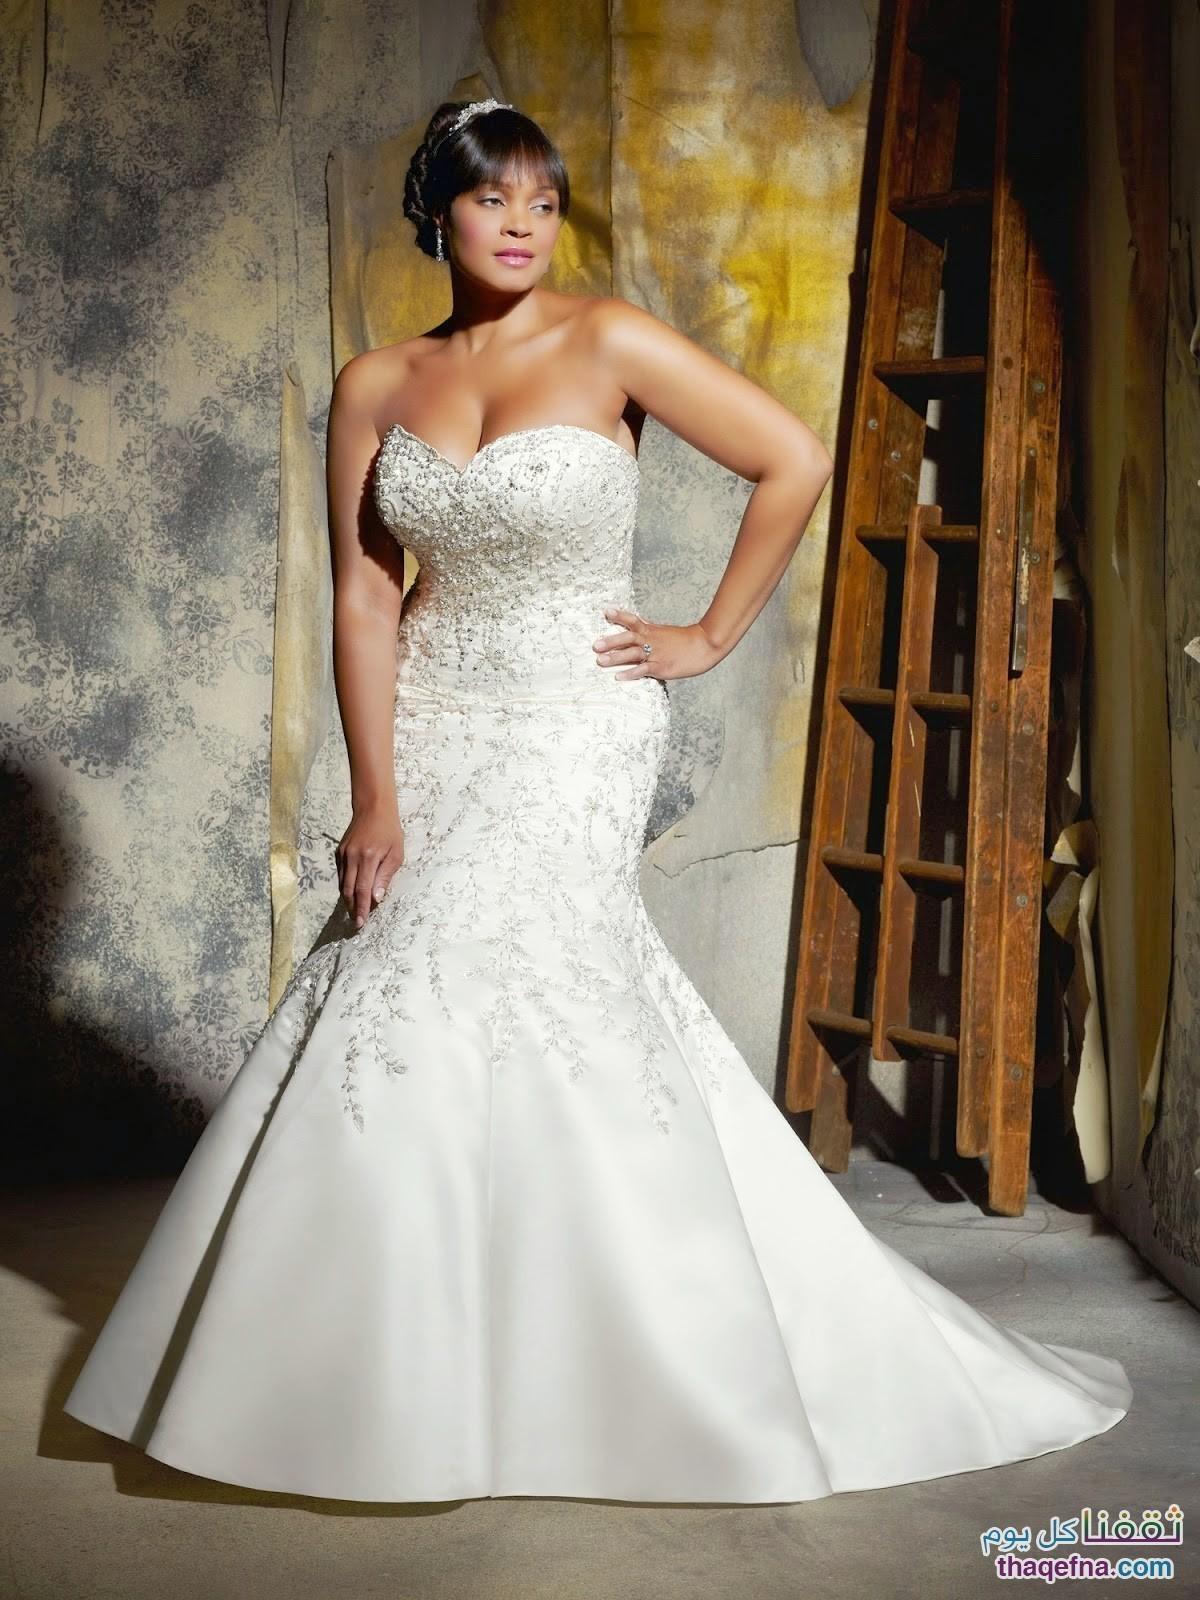 52a77dba298d5 أجمل وأحدث صور فساتين زفاف لعام 2015 – 2016 – ثقفنا كل يوم